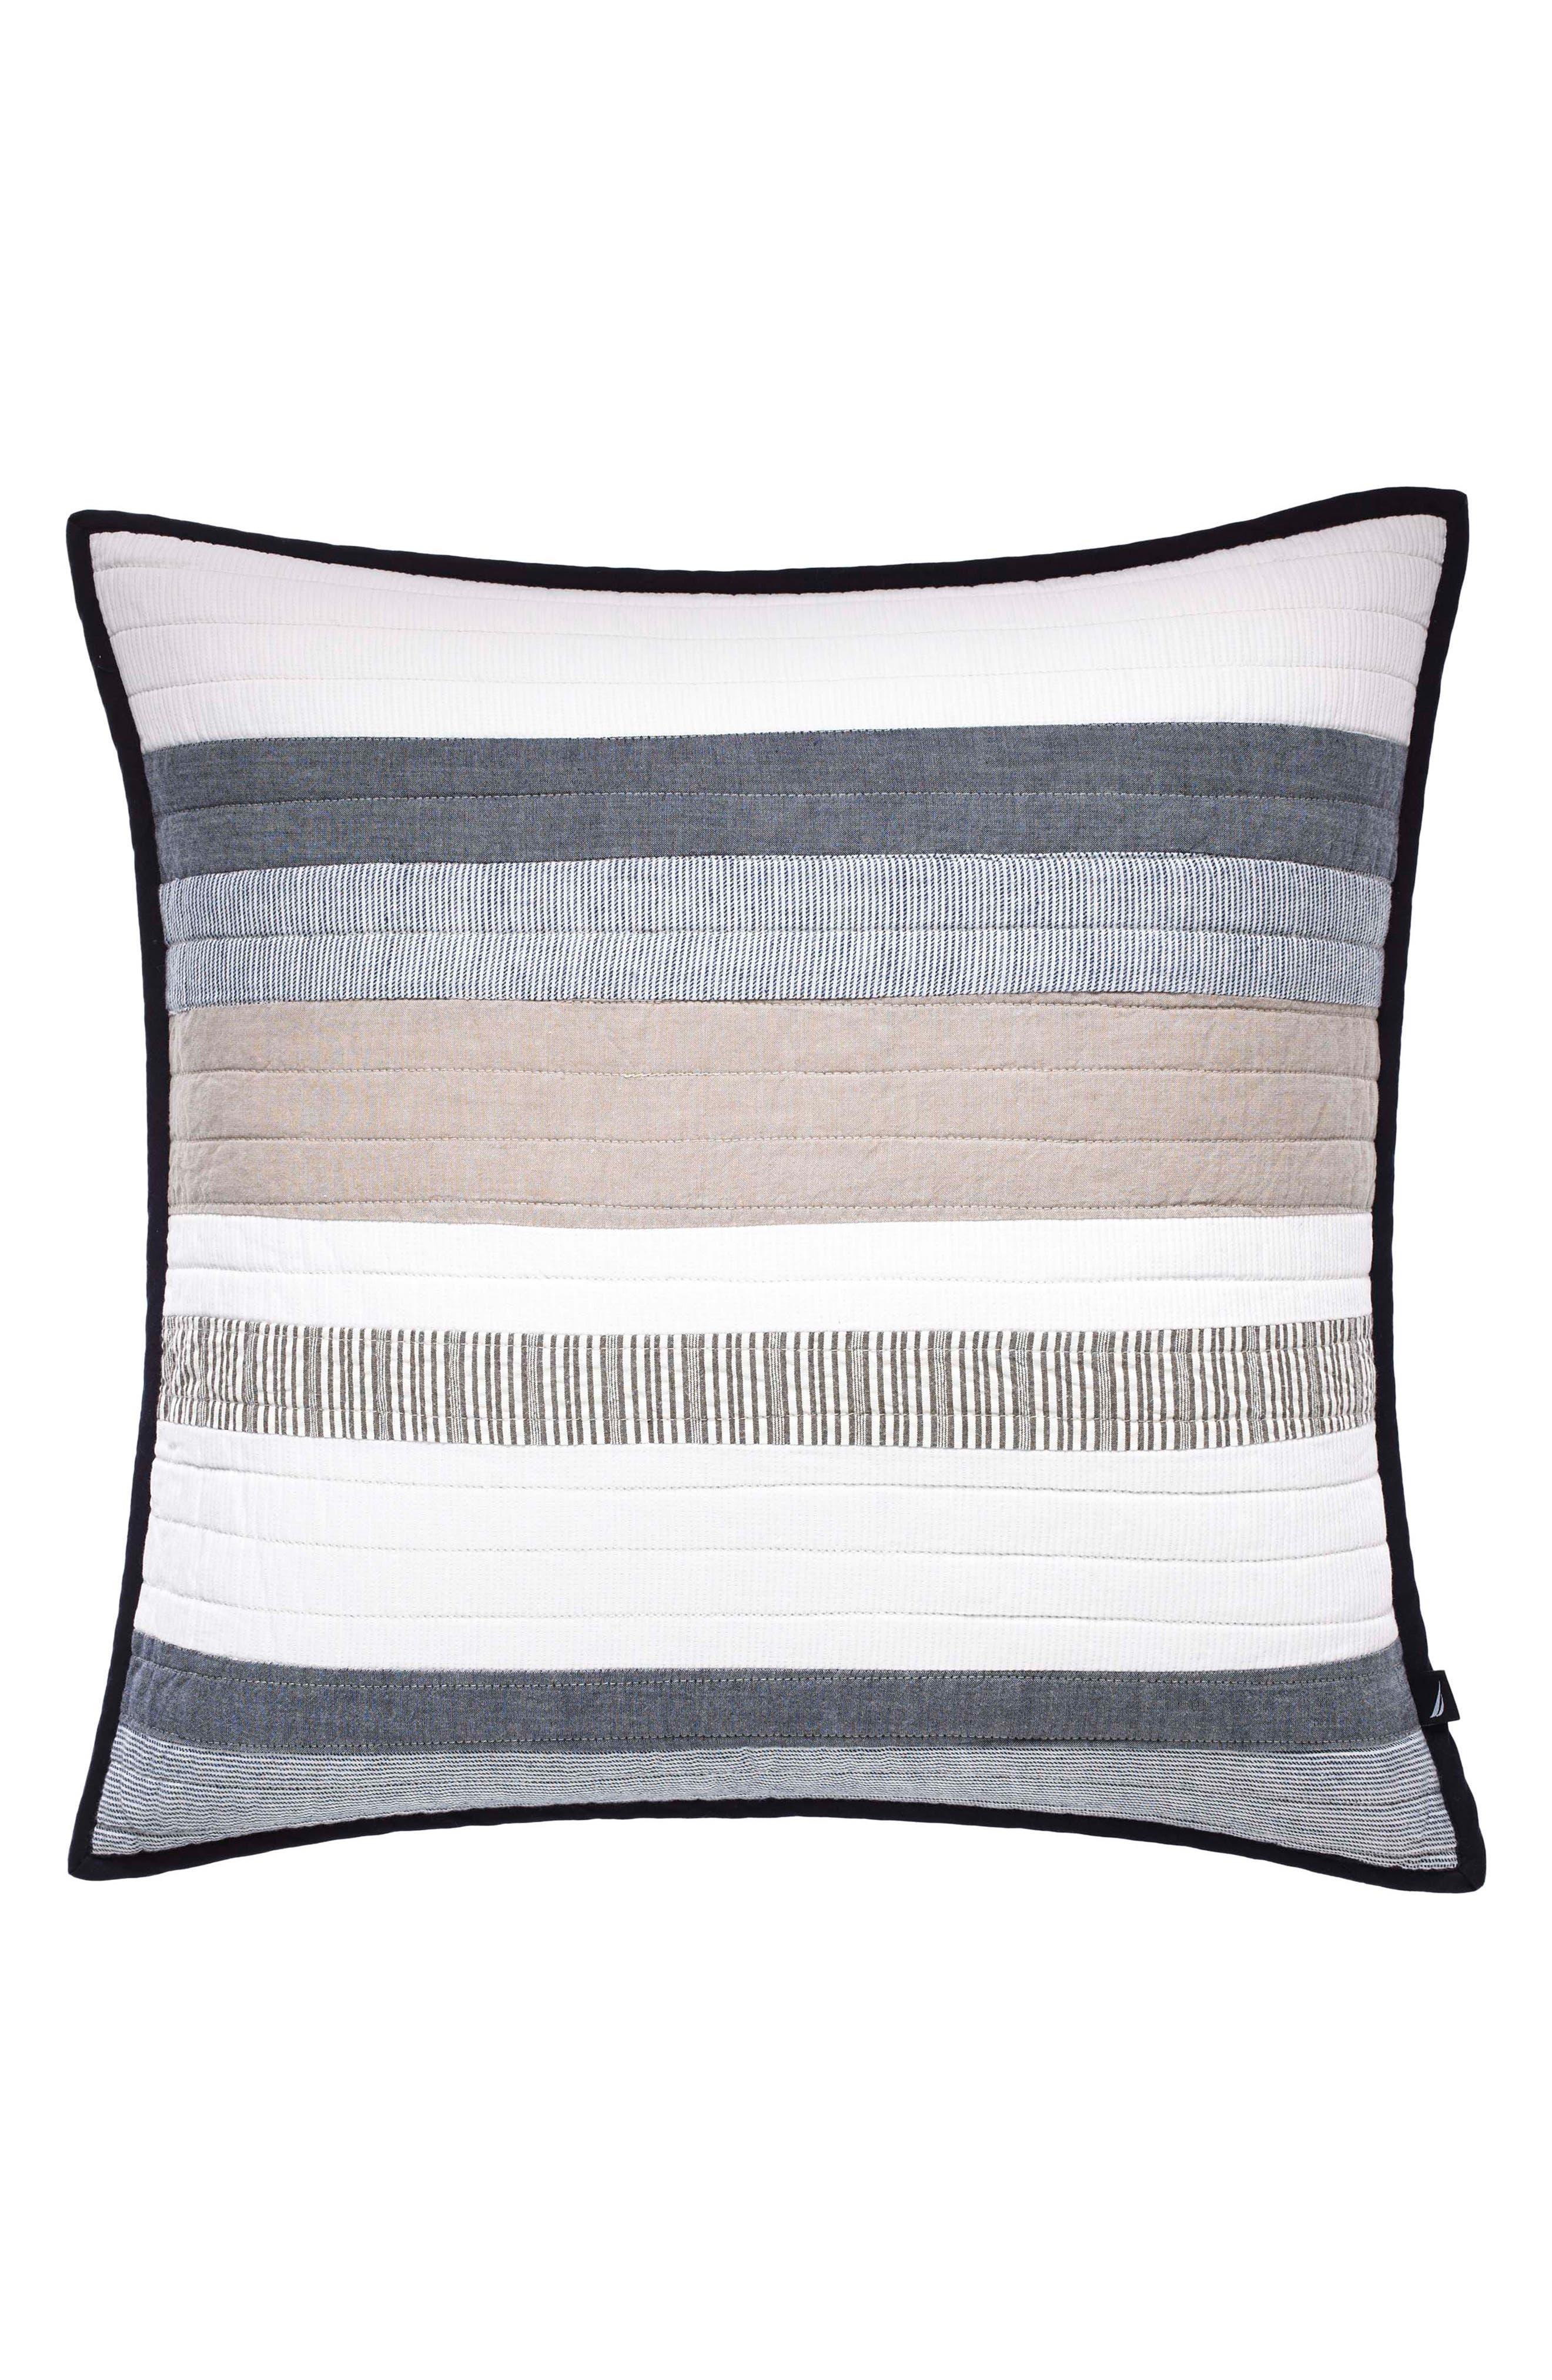 'Tideaway' Pillow,                             Alternate thumbnail 2, color,                             020